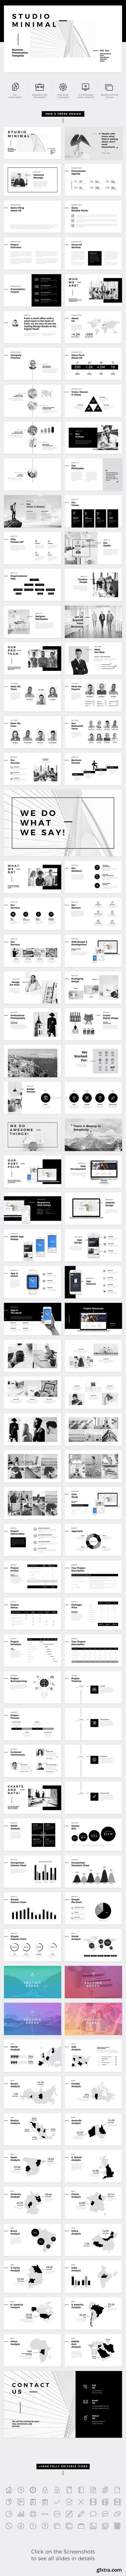 Graphicriver - Studio Minimal Presentation PowerPoint Template 20939116